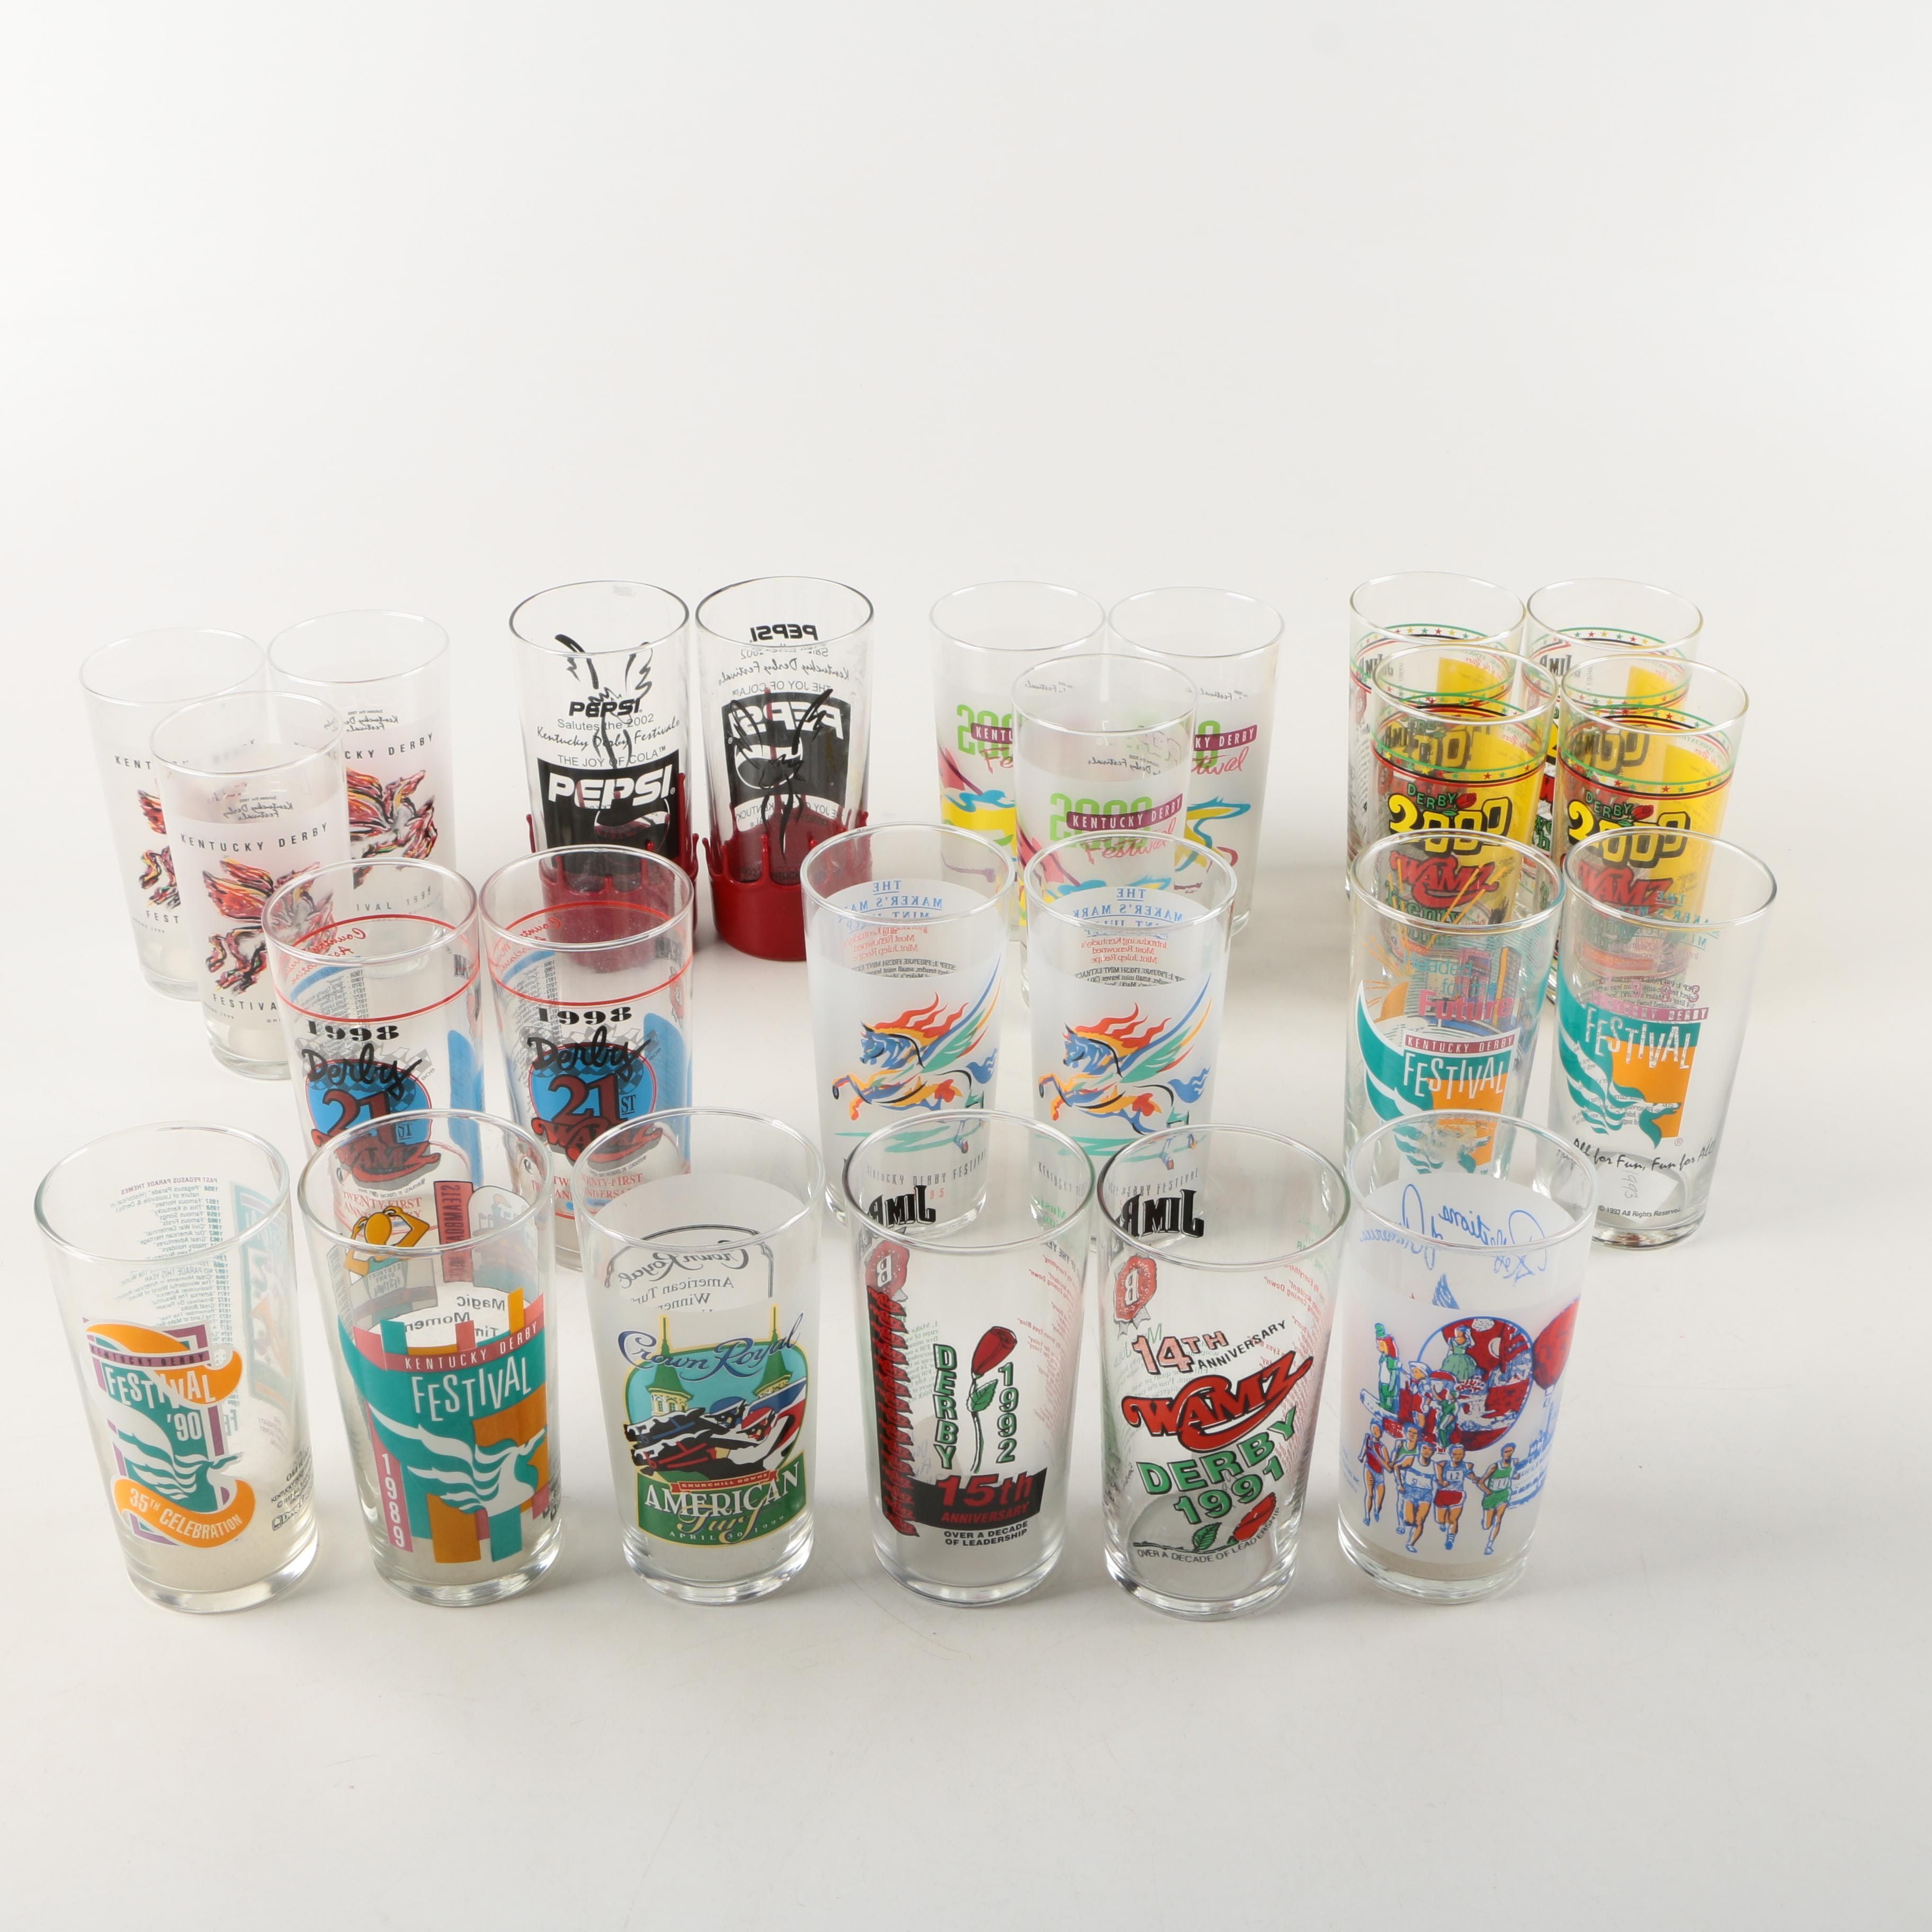 Assortment of Kentucky Derby Glasses